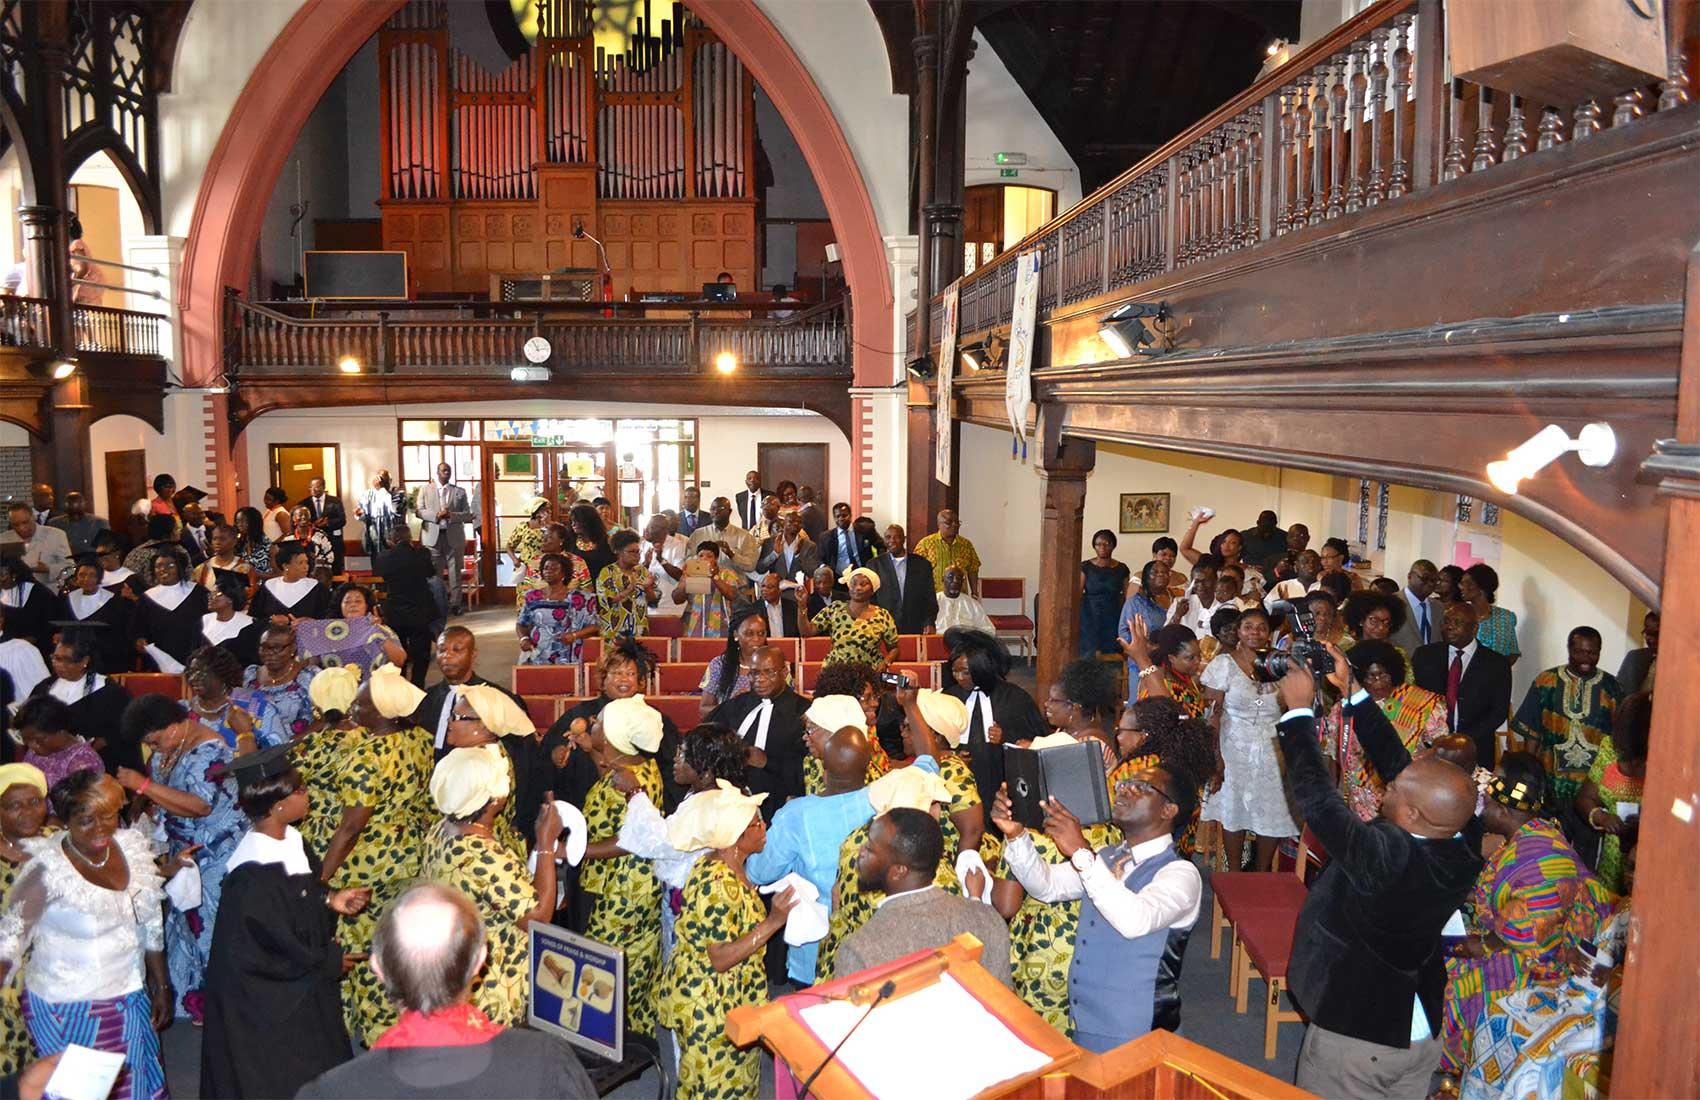 Evangelical Presbyterian Church, London (East Dulwich) Photo by Edem